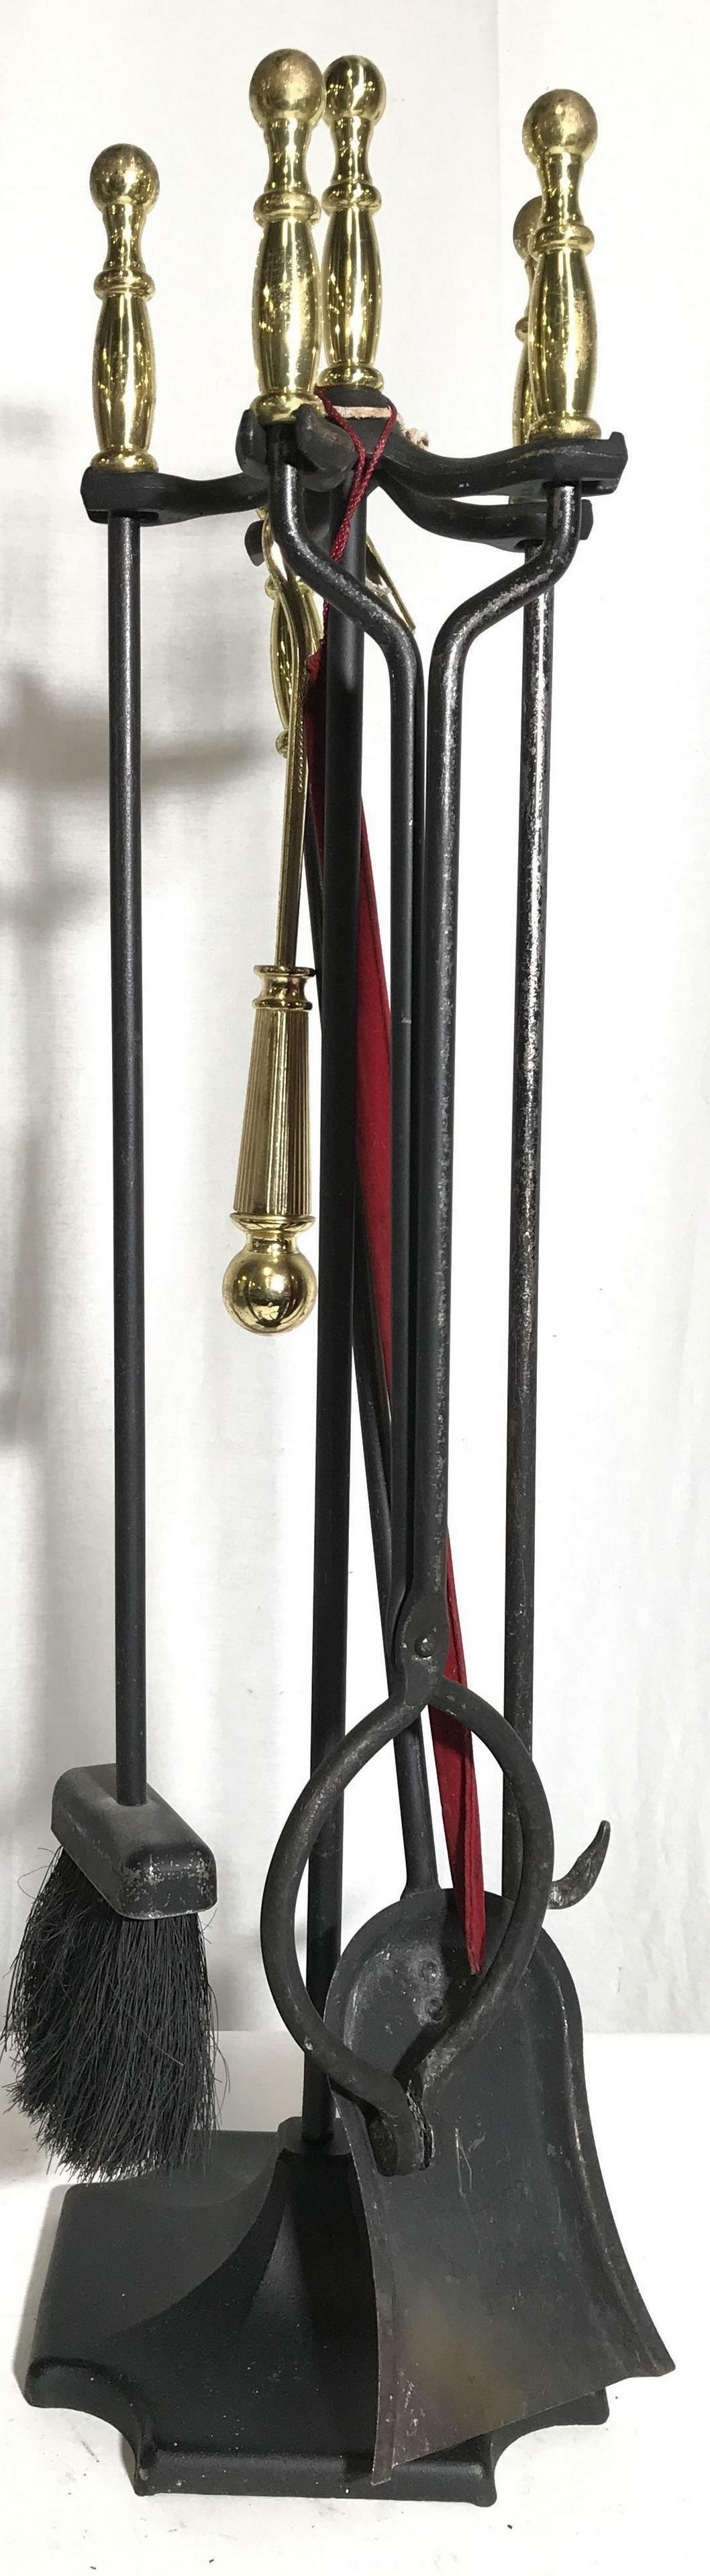 Set 5 Vintage Metal Fireplace Tools W Stand